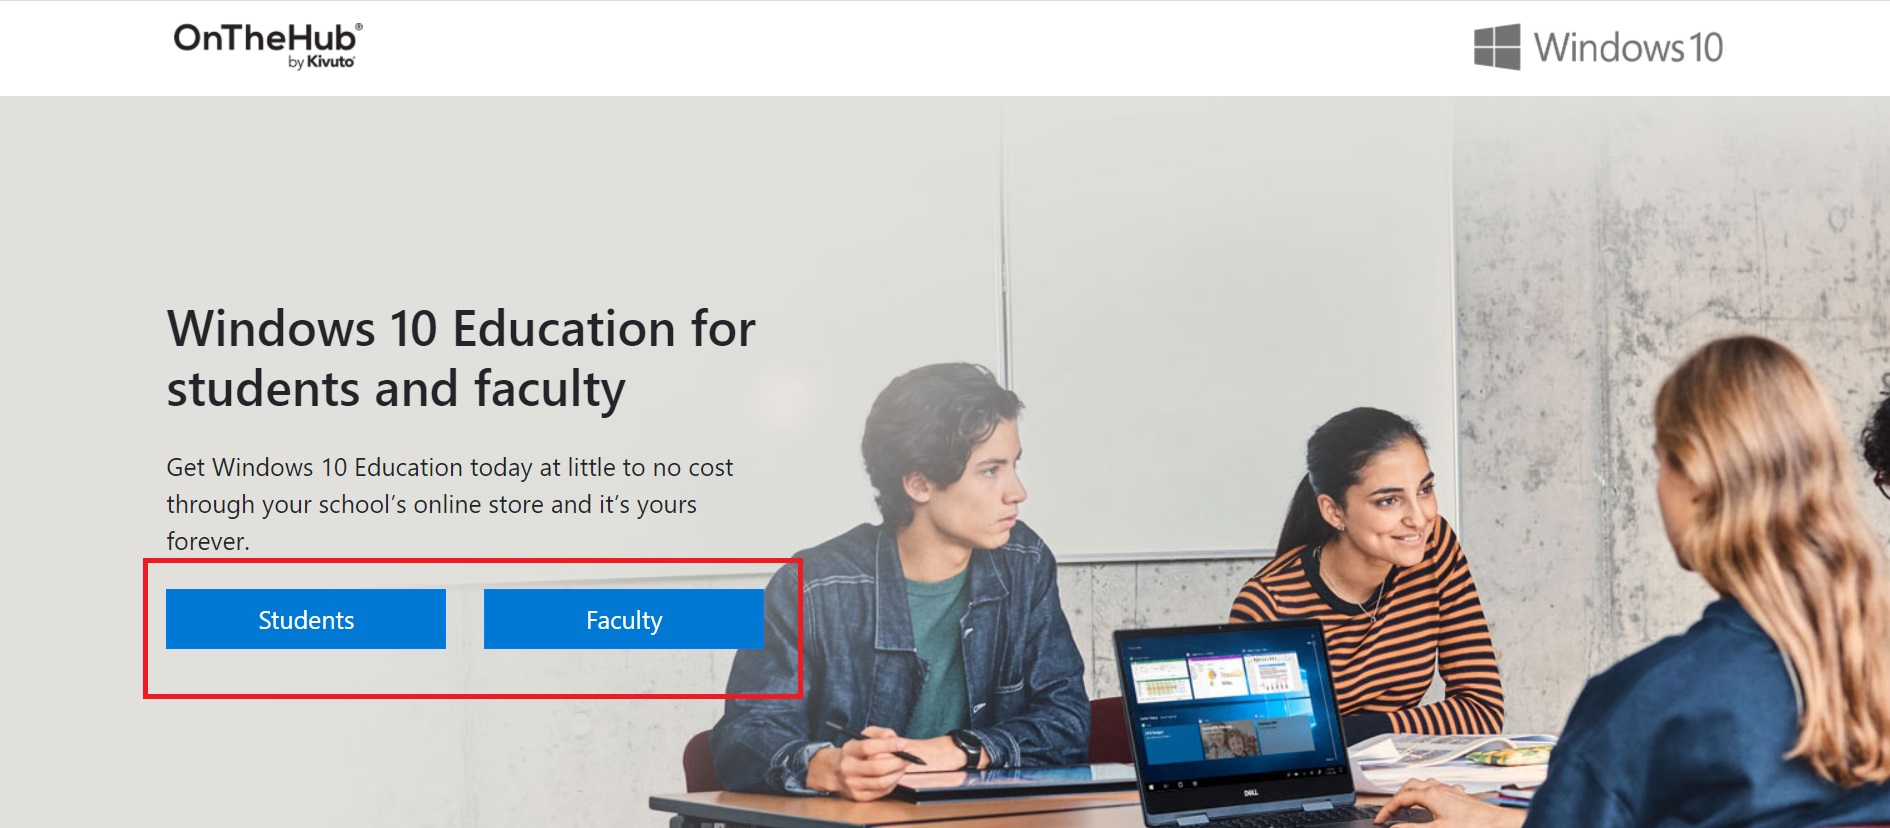 On the Hub windows 10 Education page